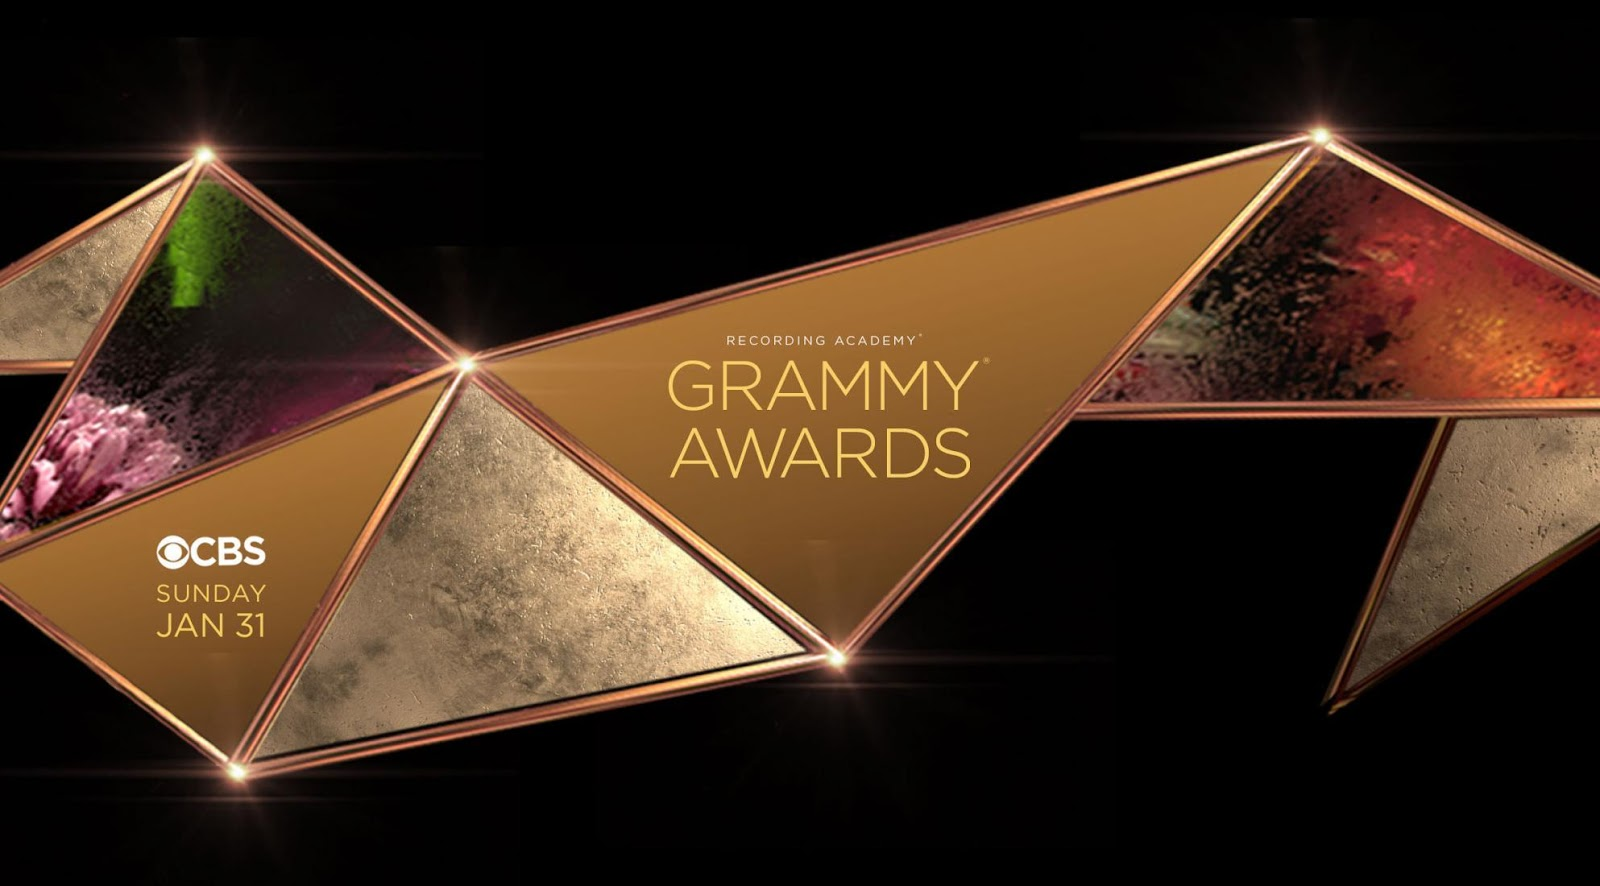 Awards Nominations & Winners   GRAMMY.com